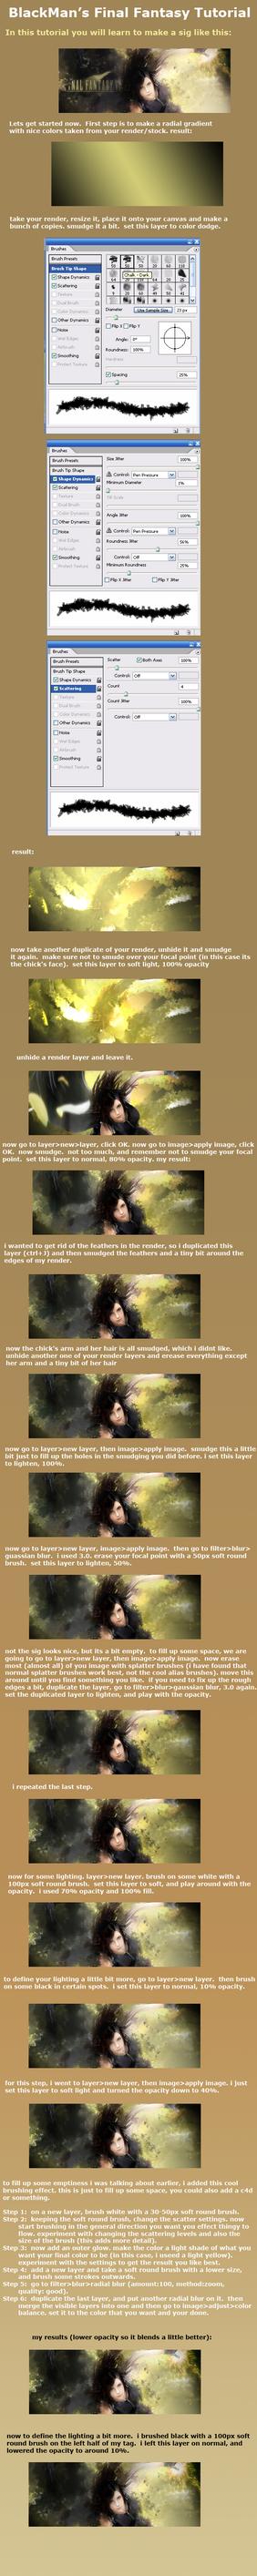 Final Fantasy Tag Tutorial 1 by mp3playah